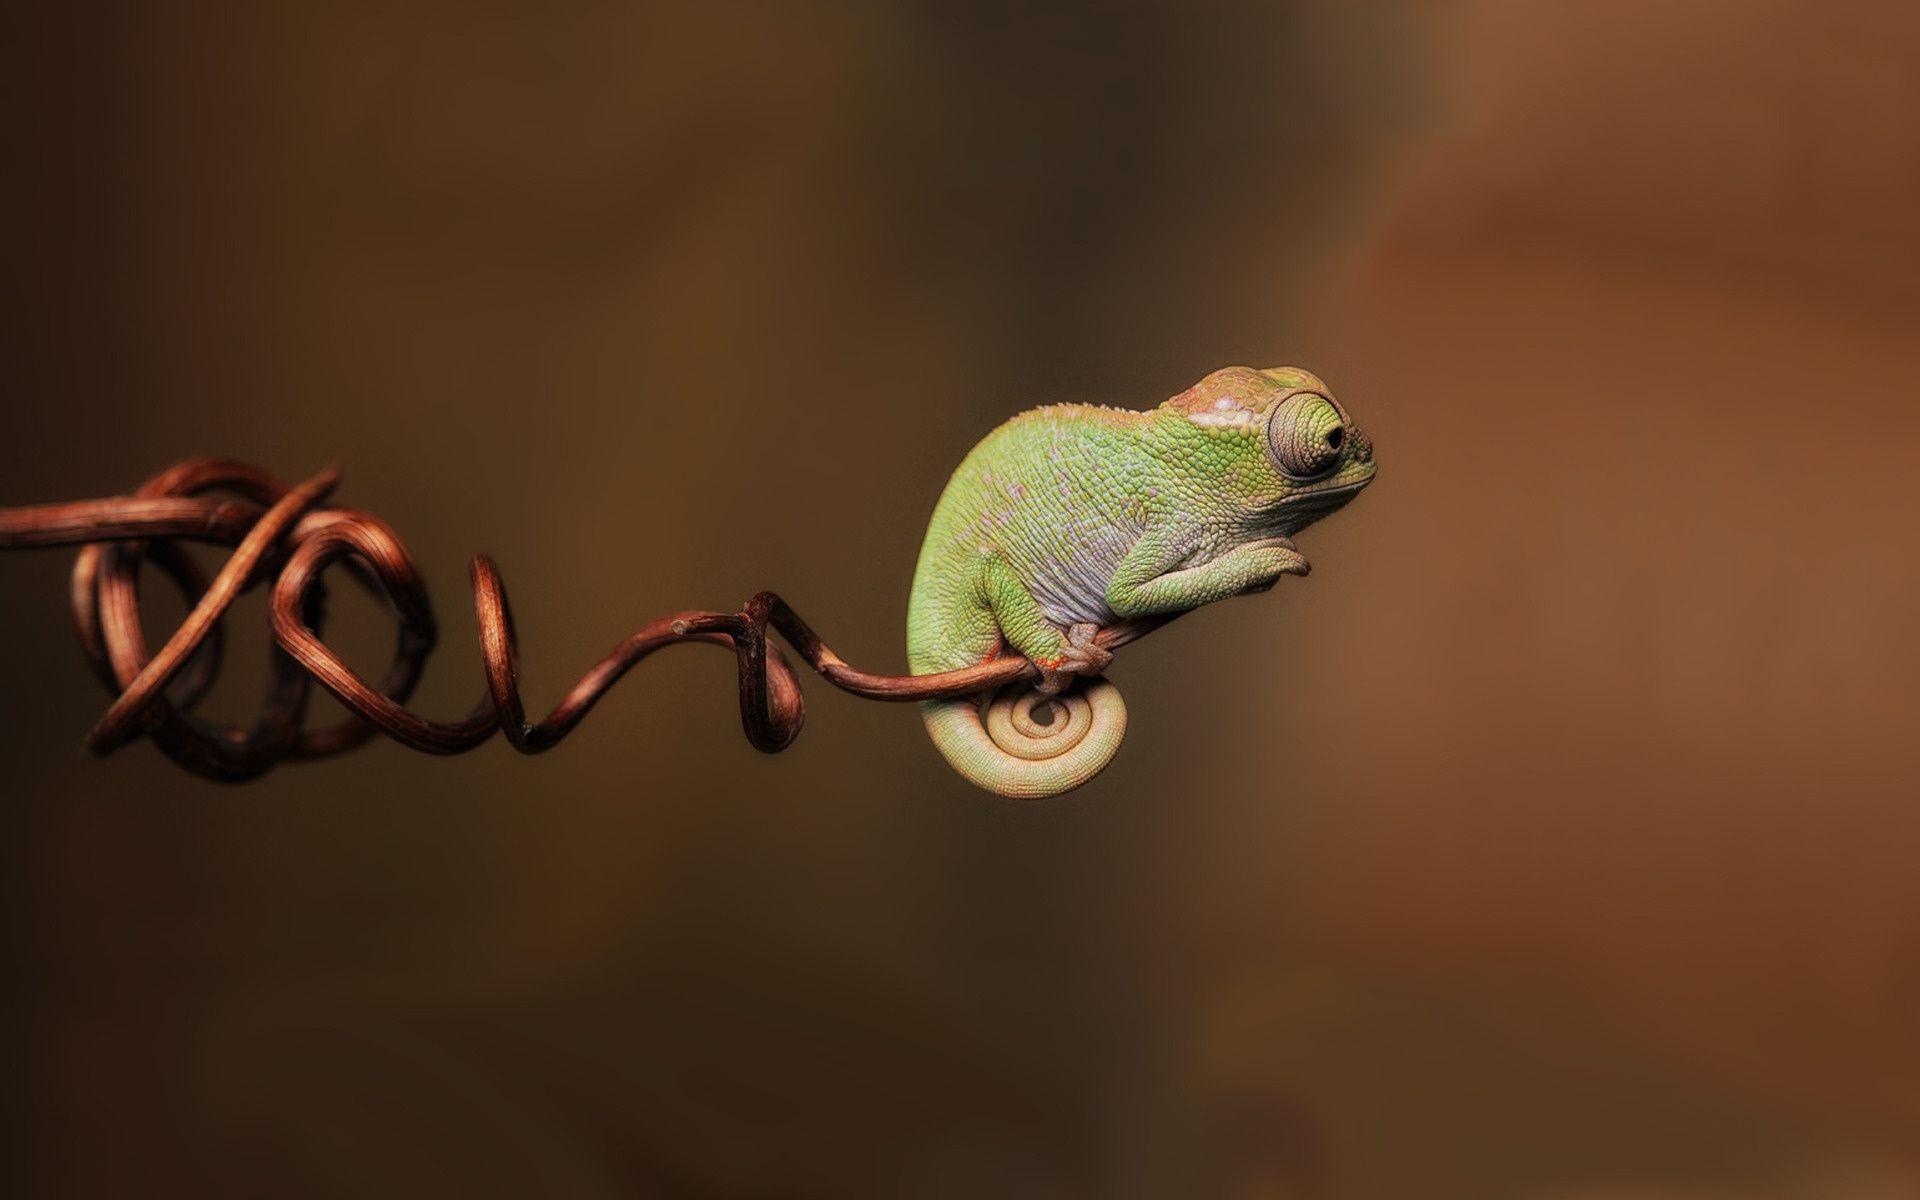 HD Wallpaper   Background ID:120847. 1920x1200 Animal Chameleon